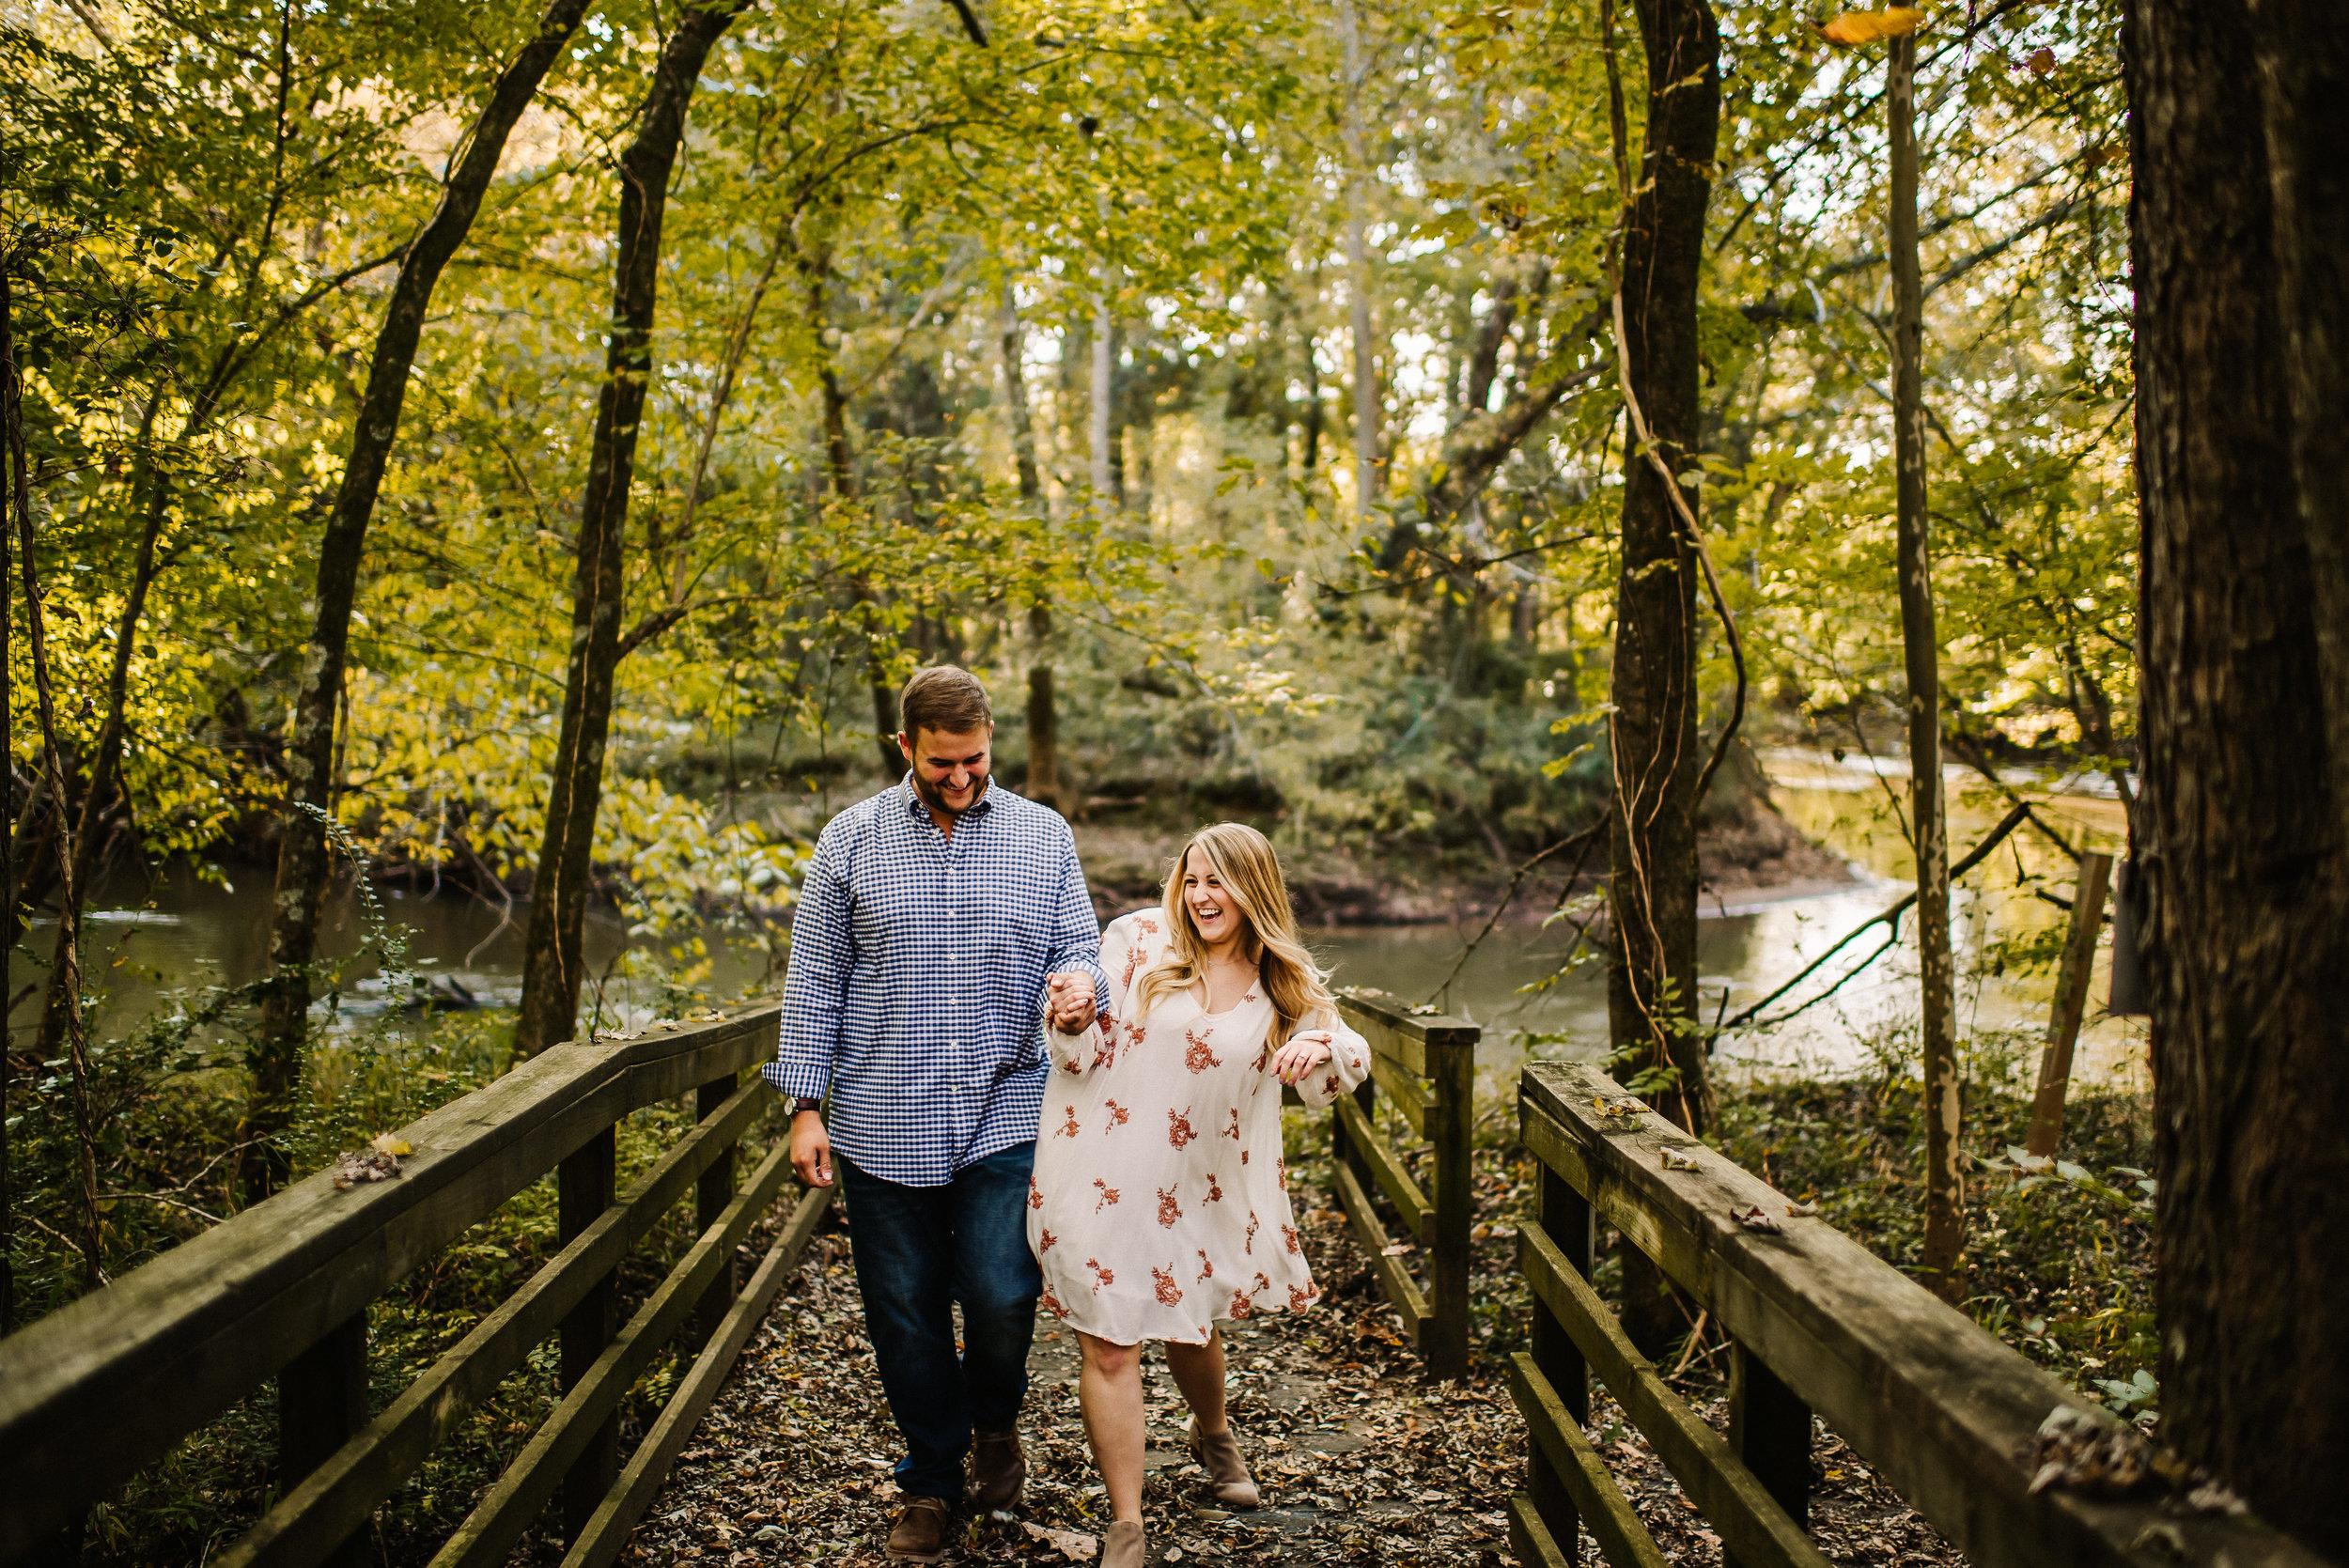 Romantic Fall Engagement Photography_Alexis & Jacob_Ashley Benham Photography-18.jpg